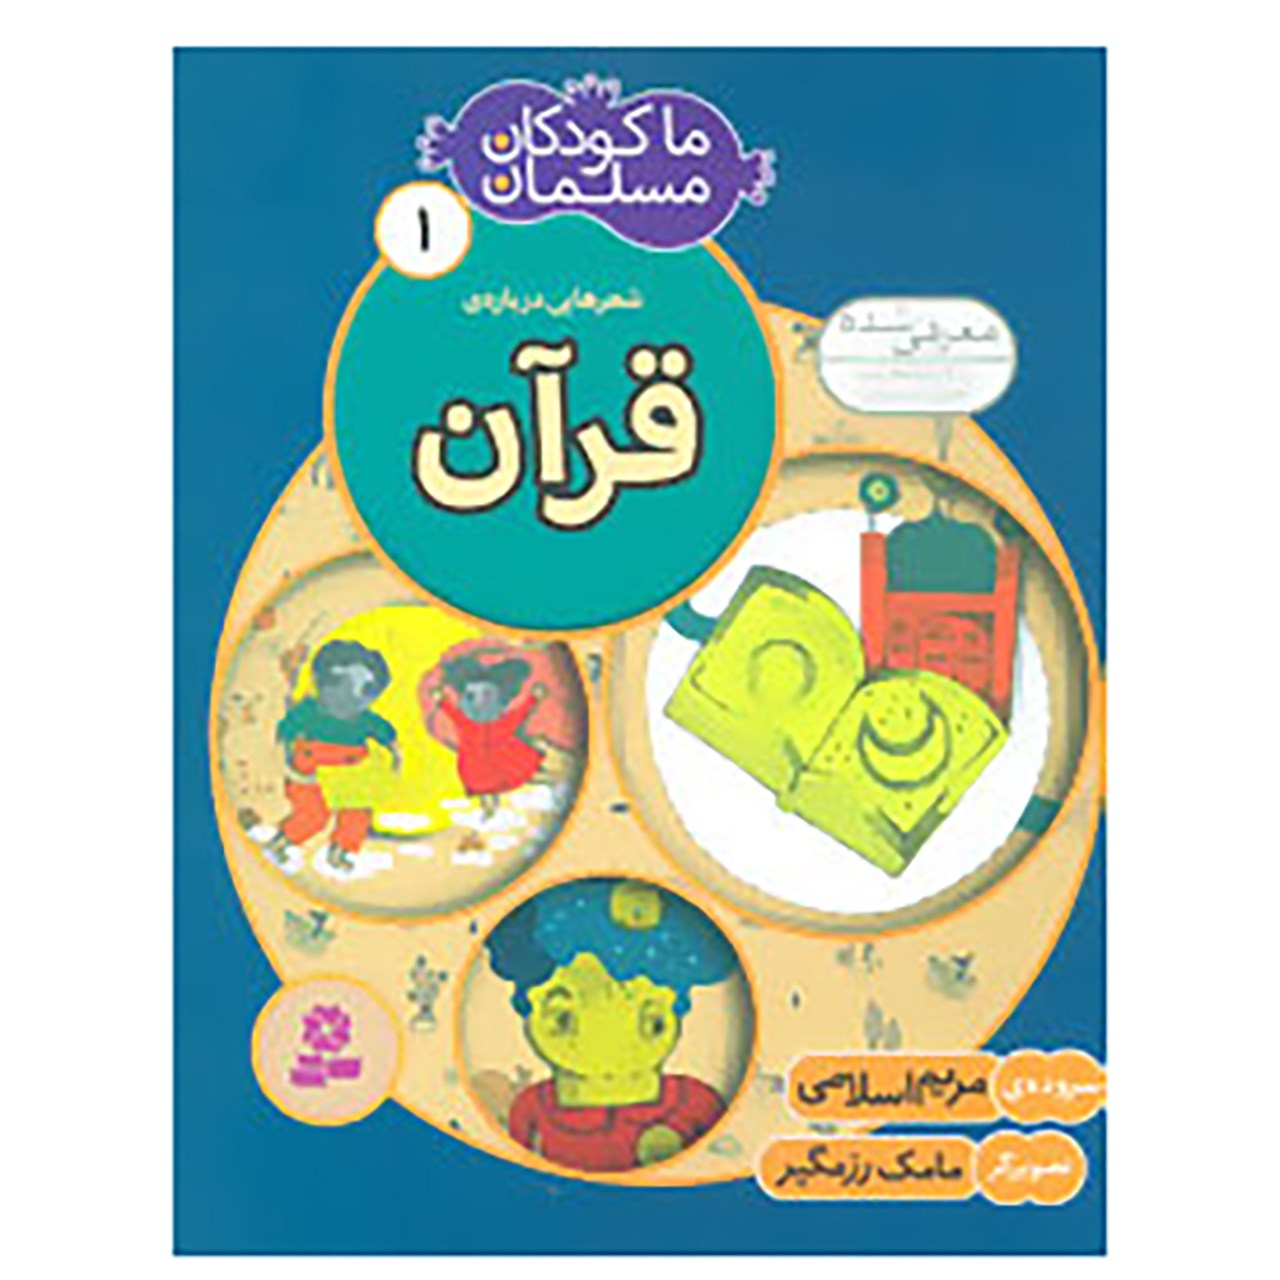 خرید                      کتاب ما کودکان مسلمان 1 اثر مریم اسلامی